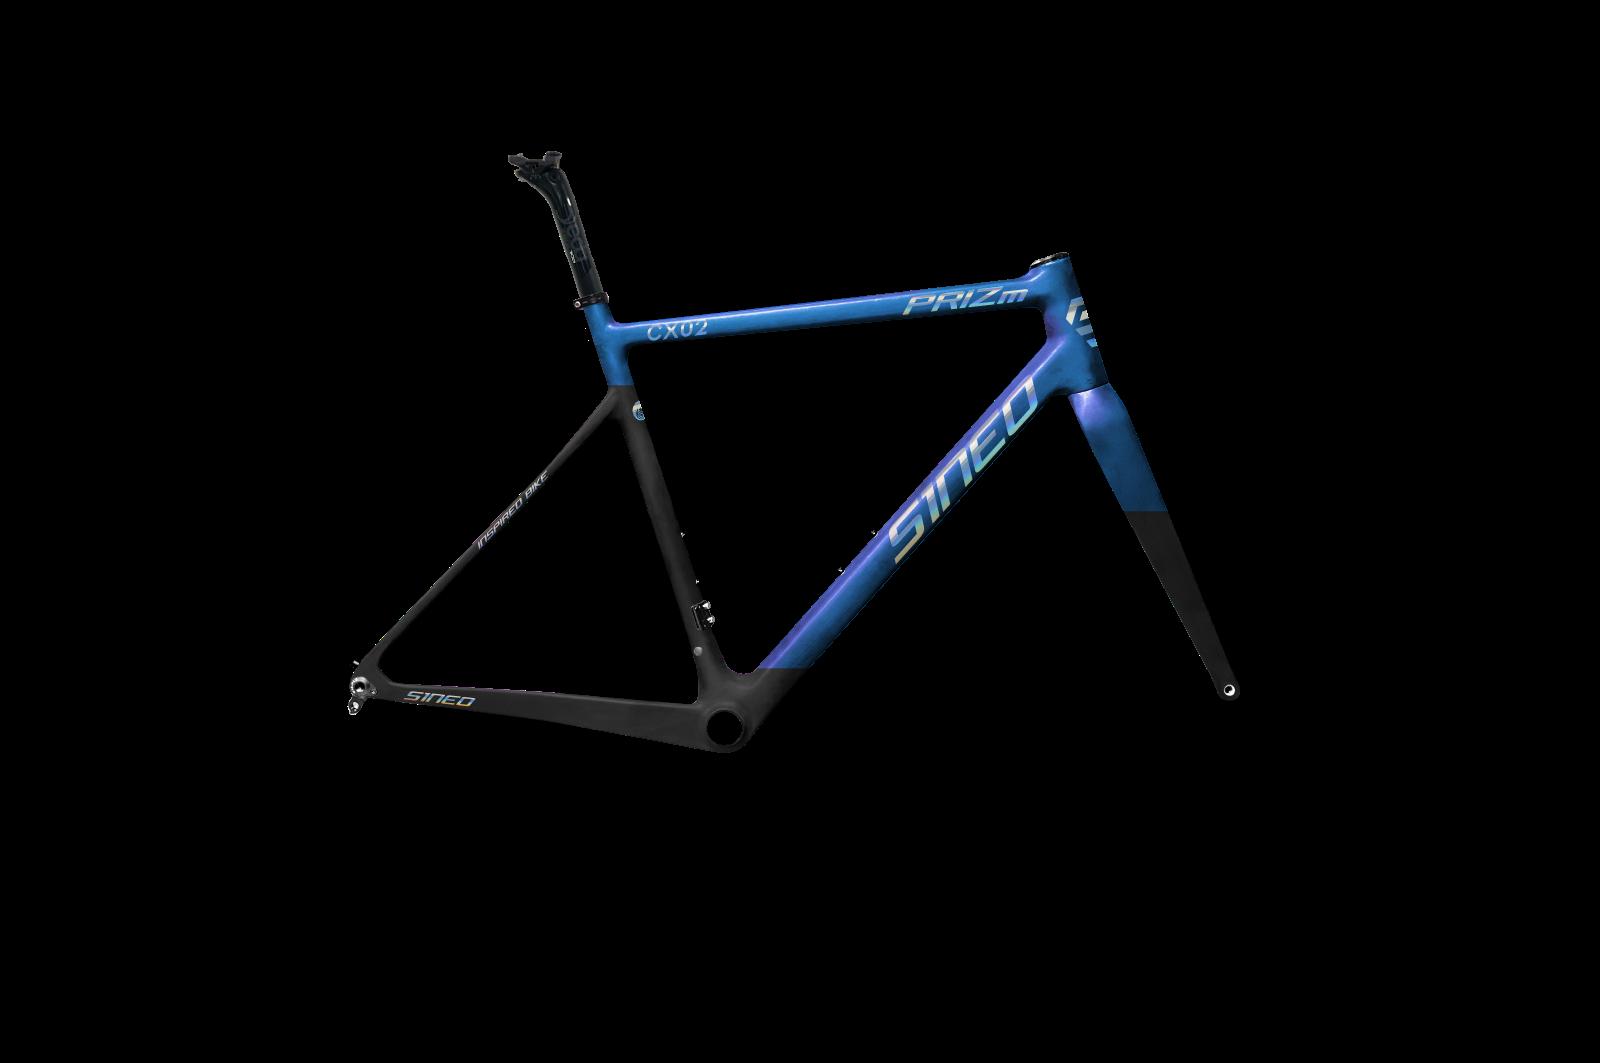 CX02 PRIZm